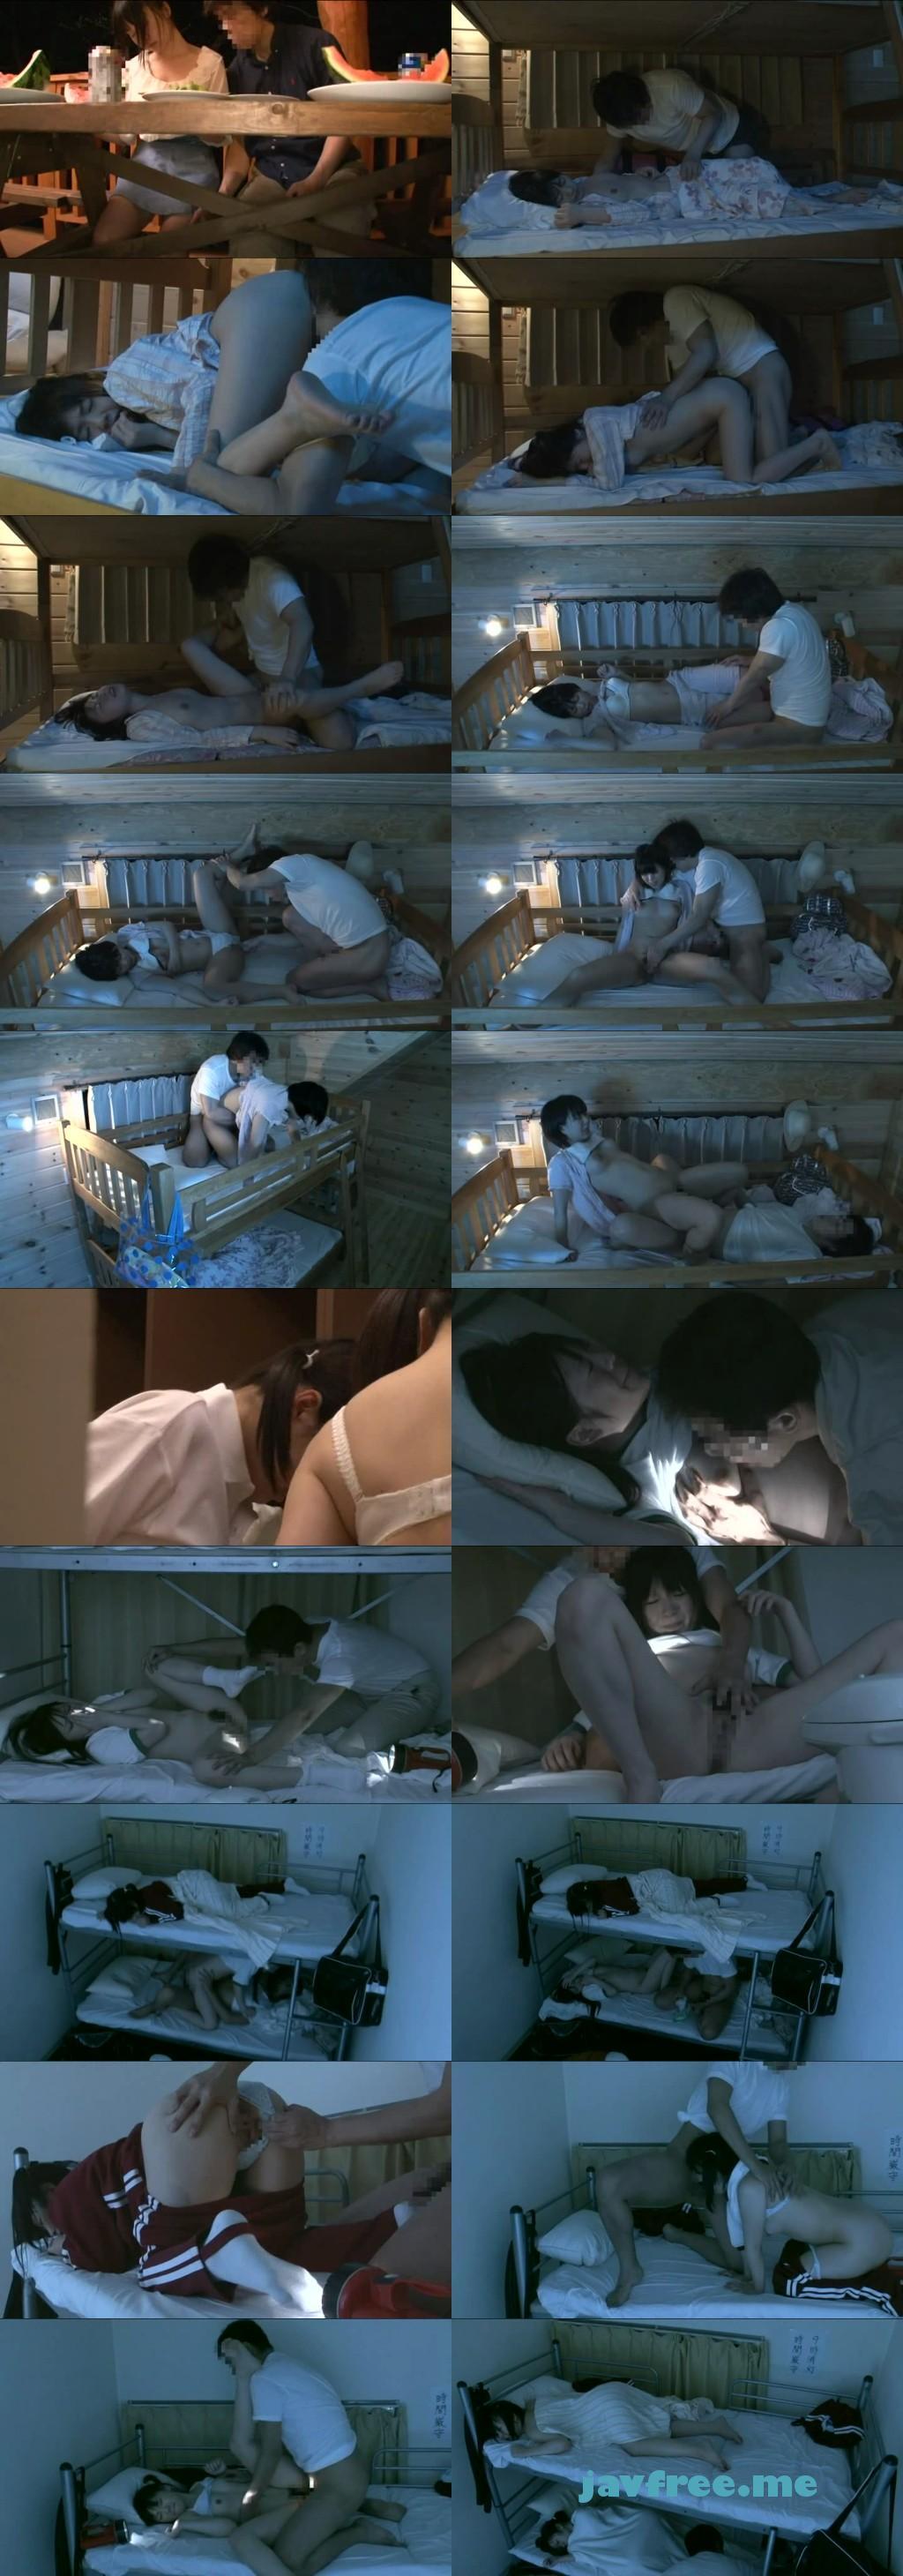 [NHDTA 277] 2段ベッドが揺れるほど感じる姉の喘ぎ声を聞いて発情しだす妹 5 夏休みSP NHDTA